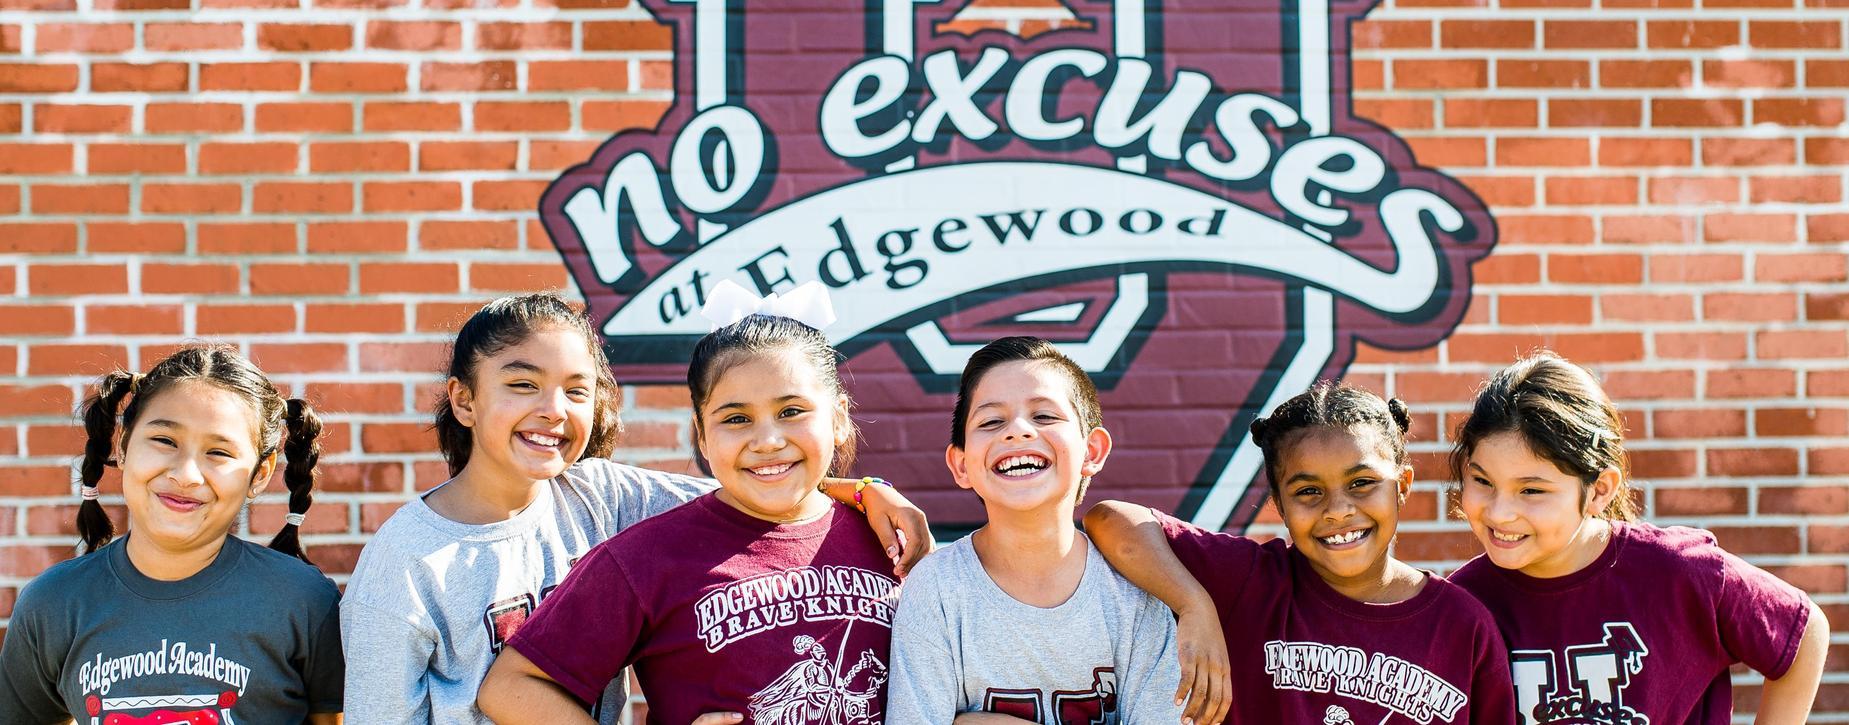 Kids at Edgewood